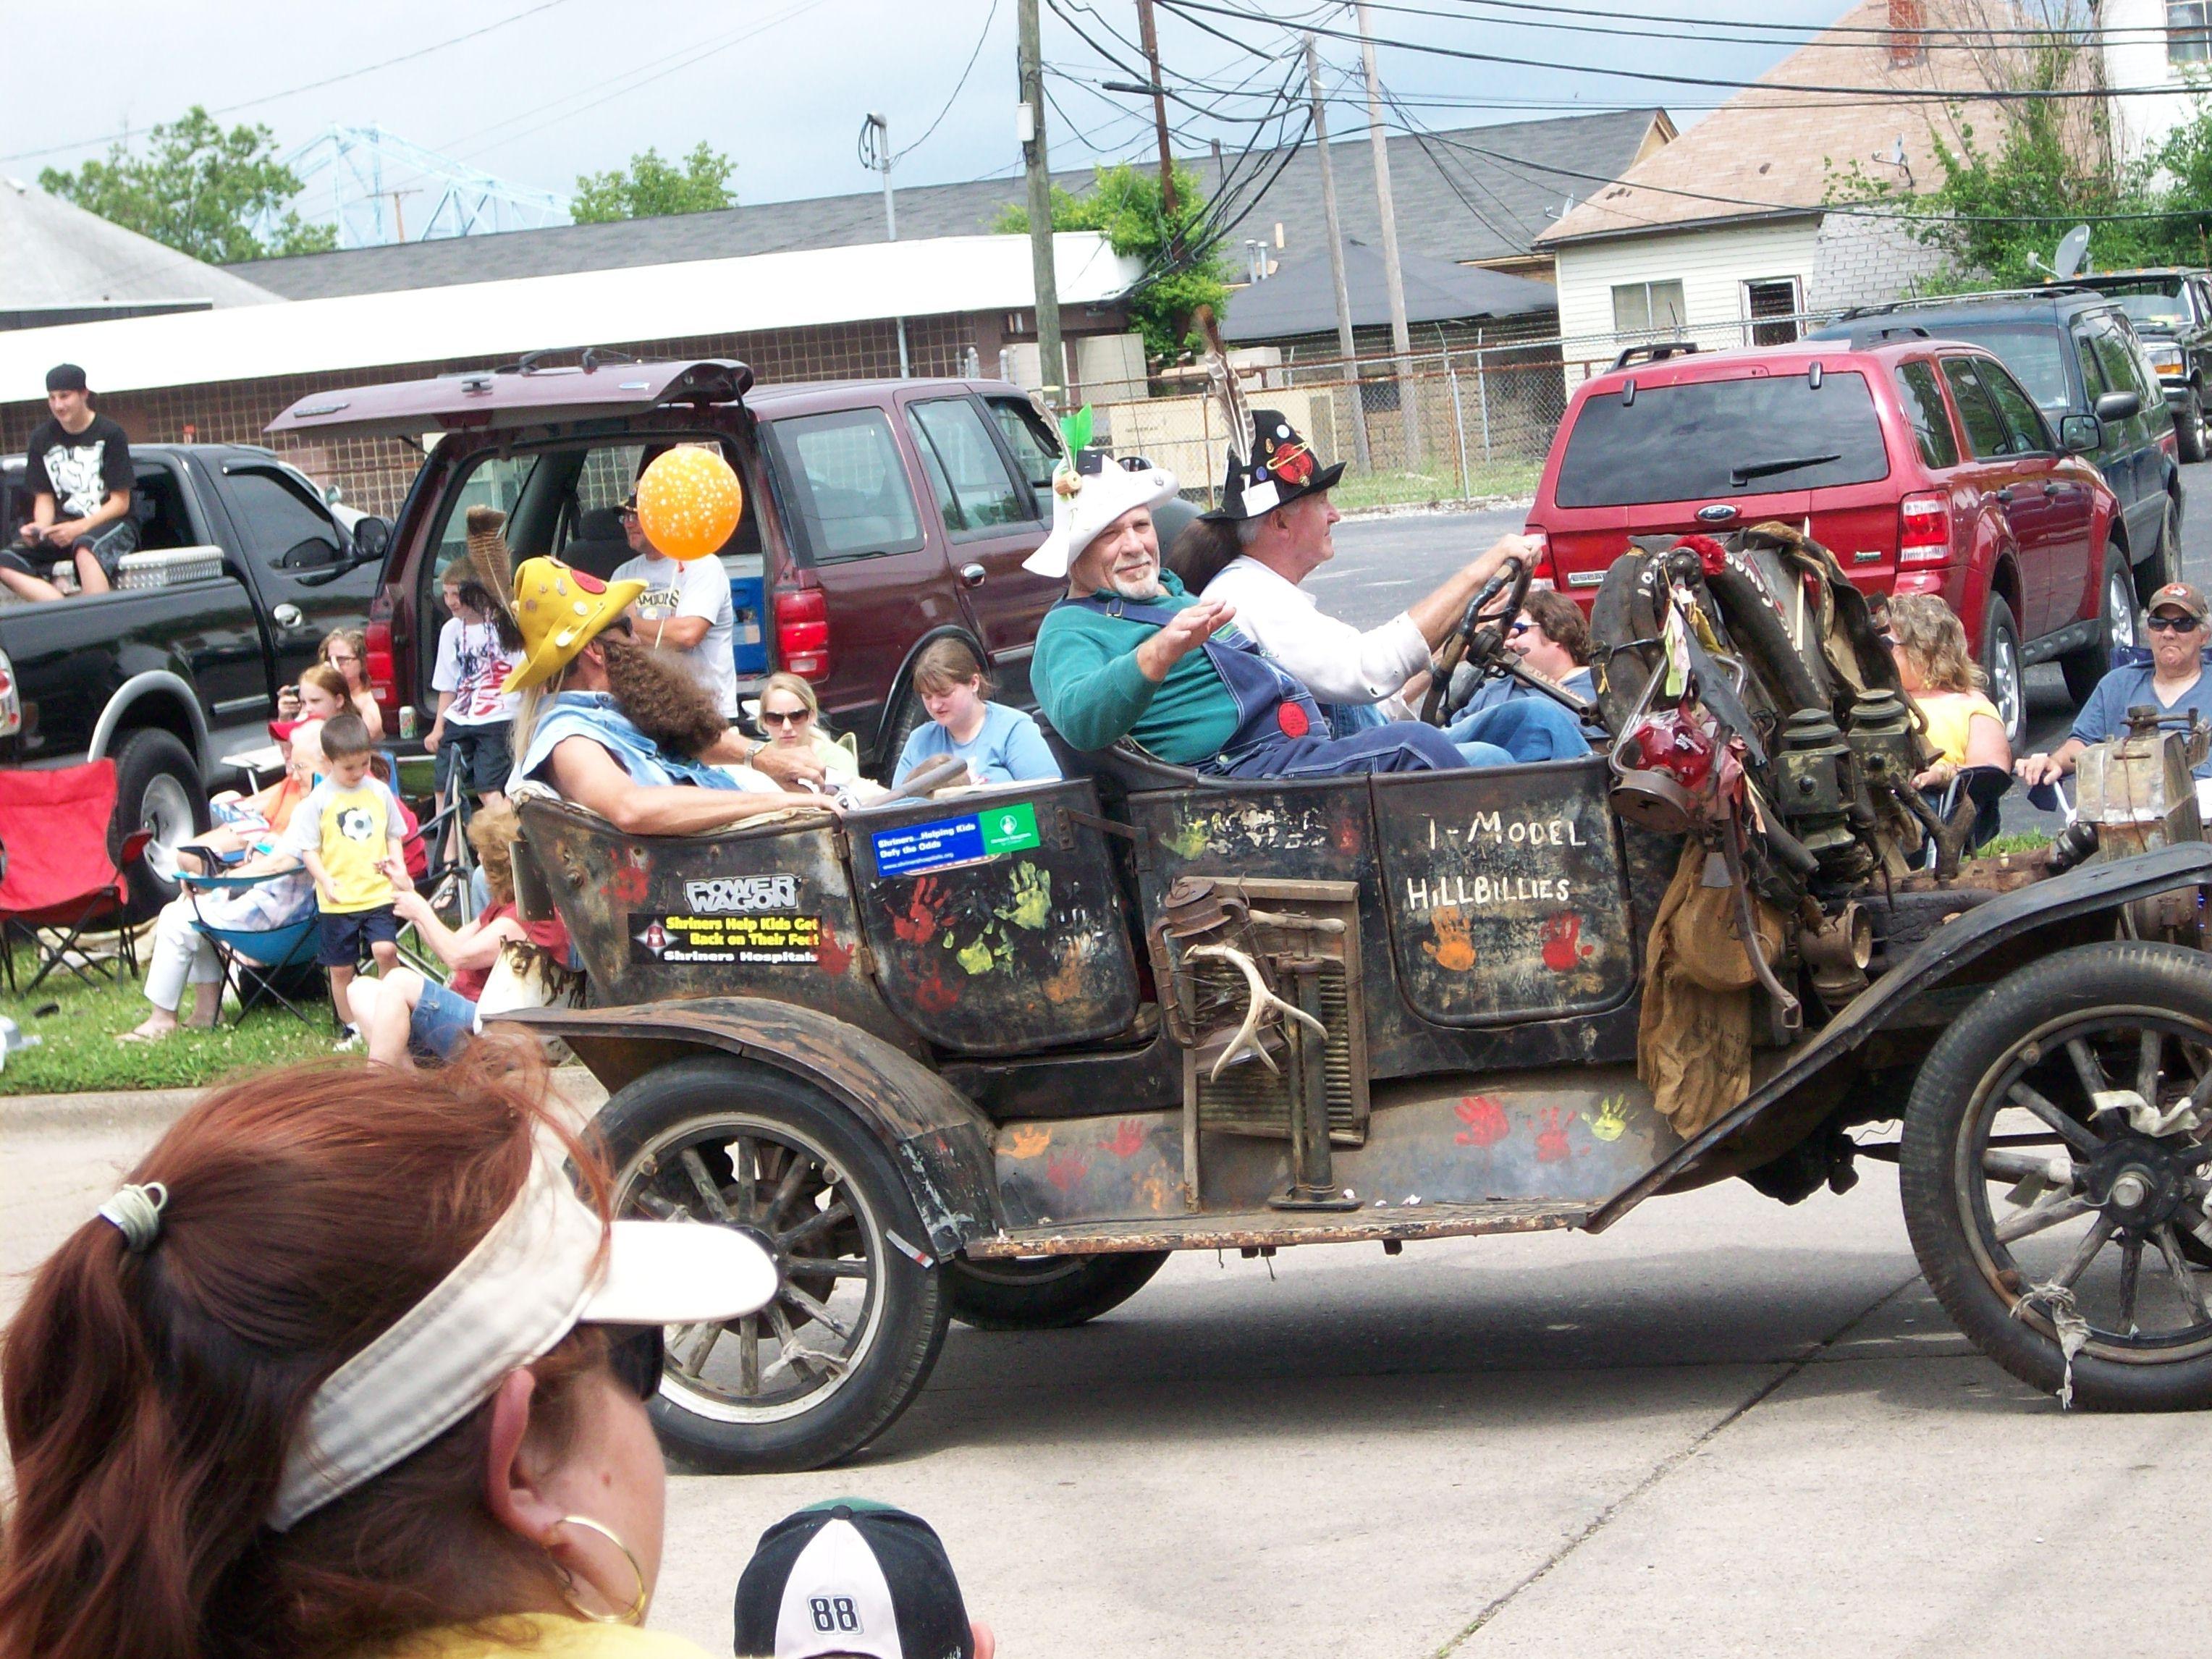 2010 Memorial Day Parade Ironton Ohio Ohio Memorial Day Hometown